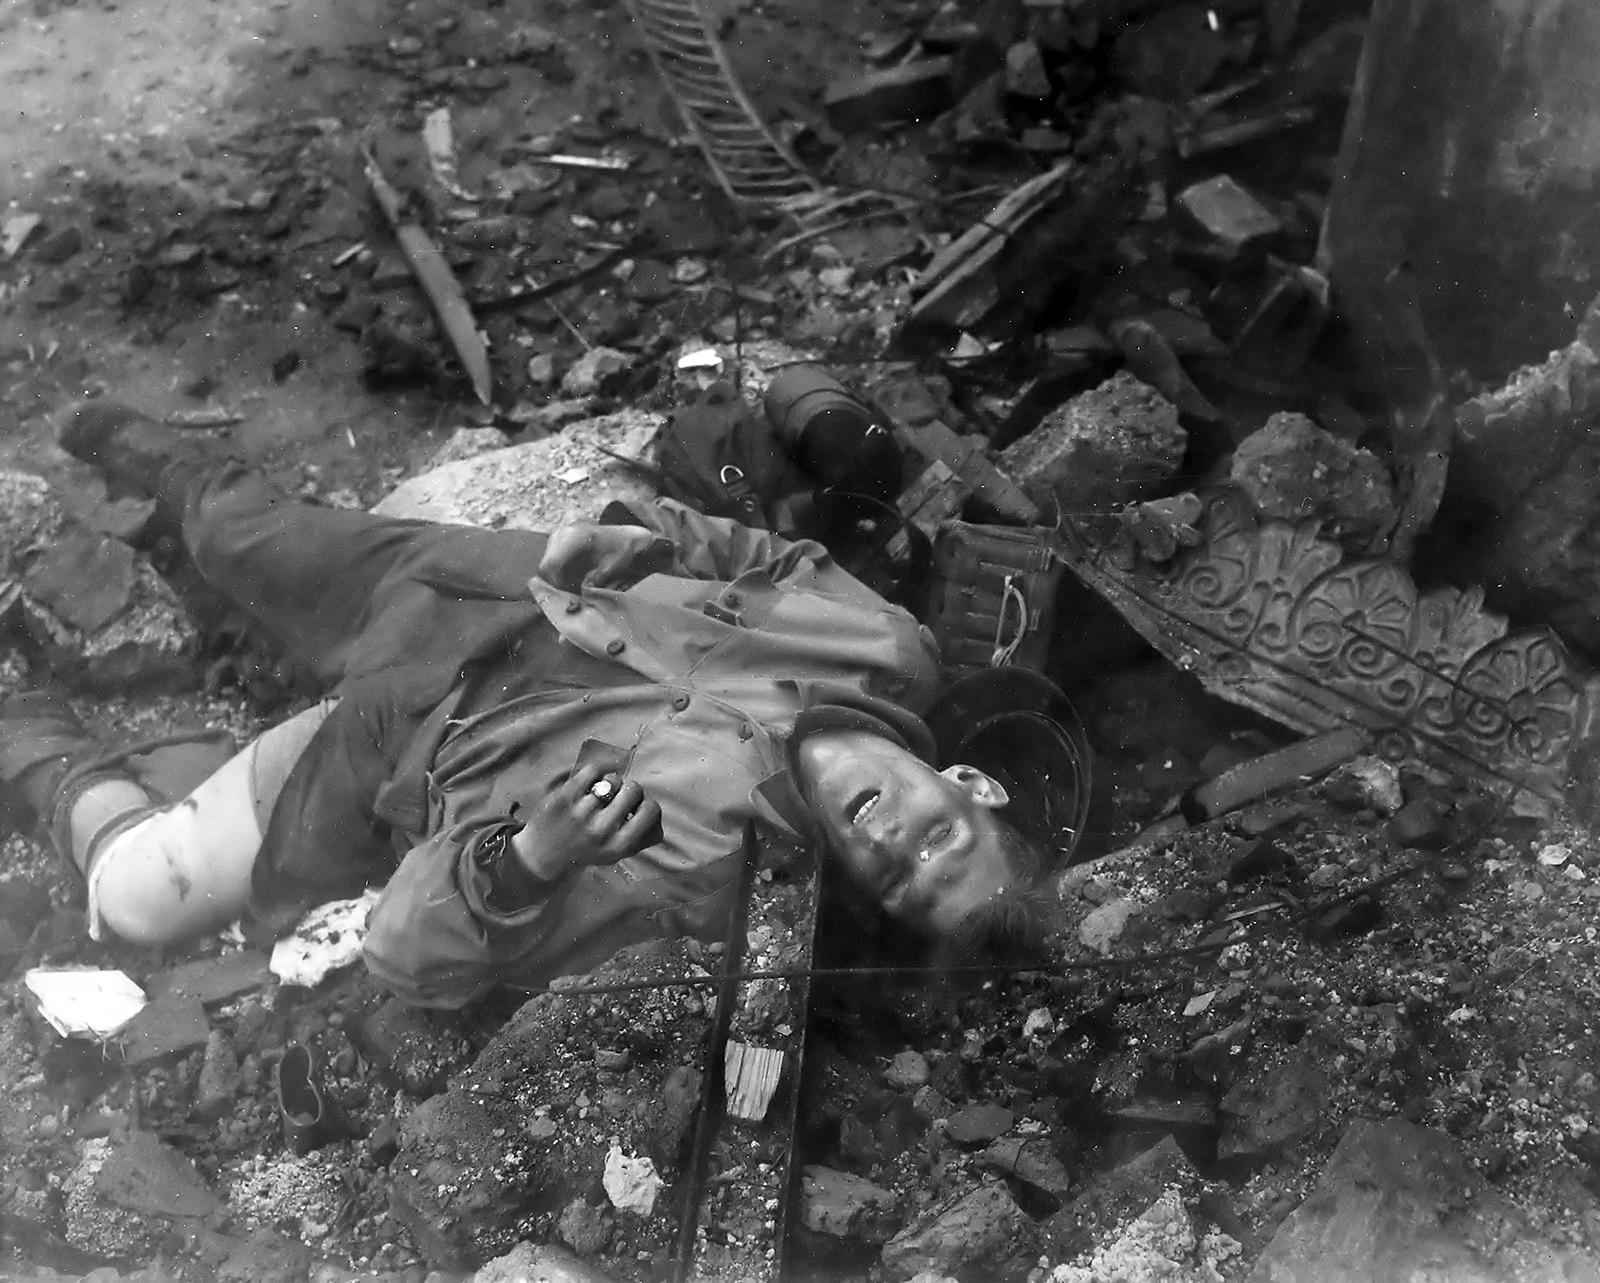 http://upload.wikimedia.org/wikipedia/commons/d/de/April-1945fatality.jpg